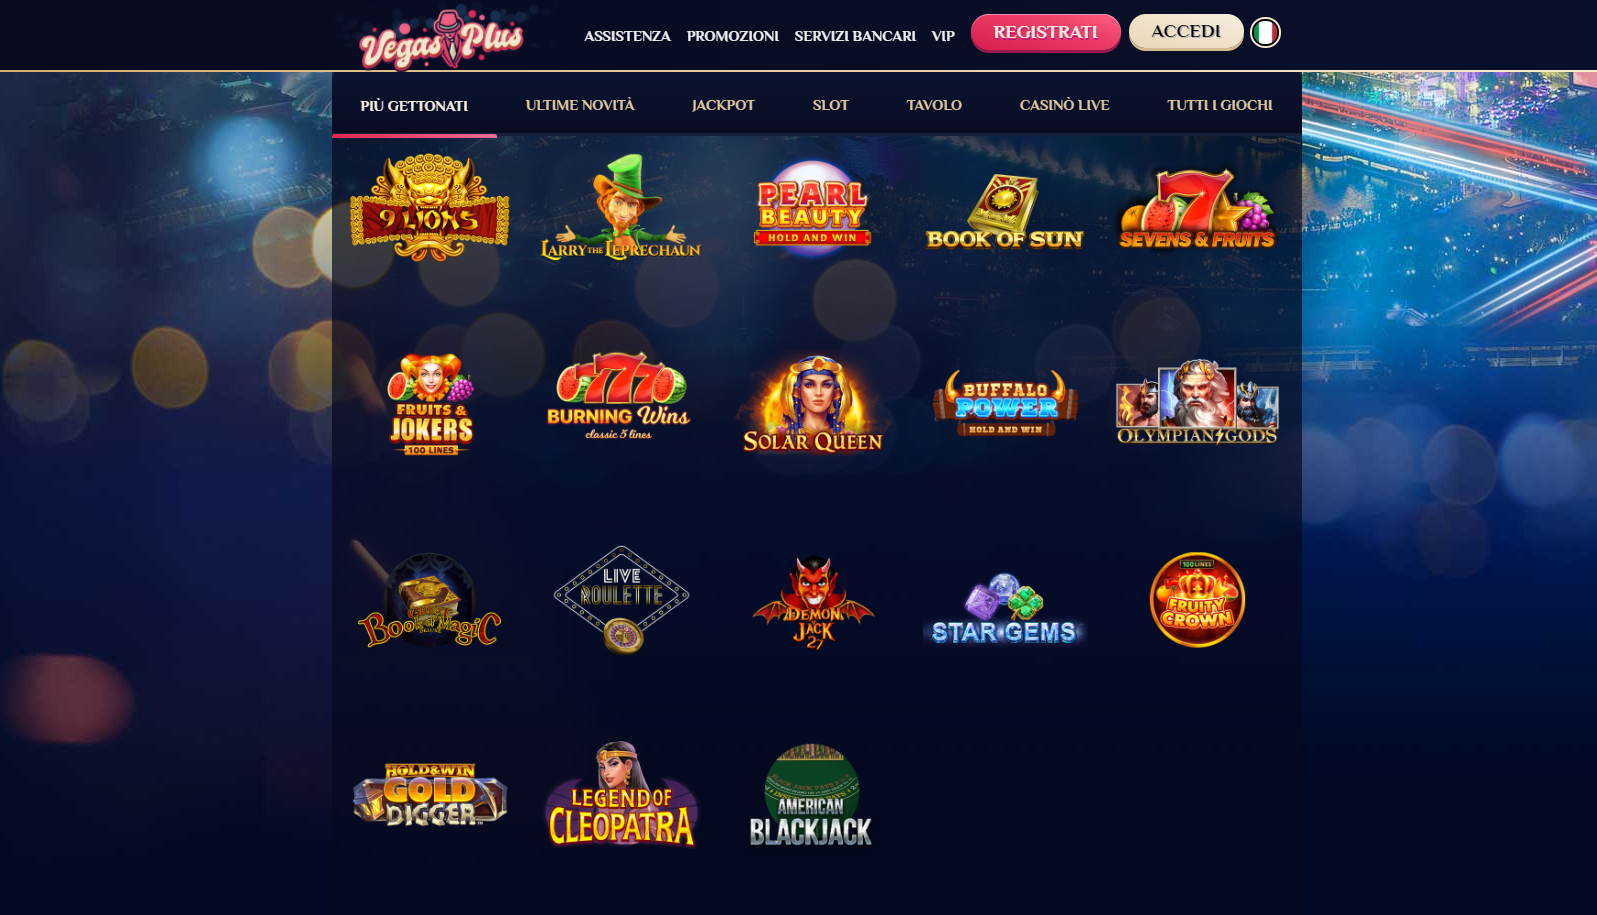 Giochi VegasPlus